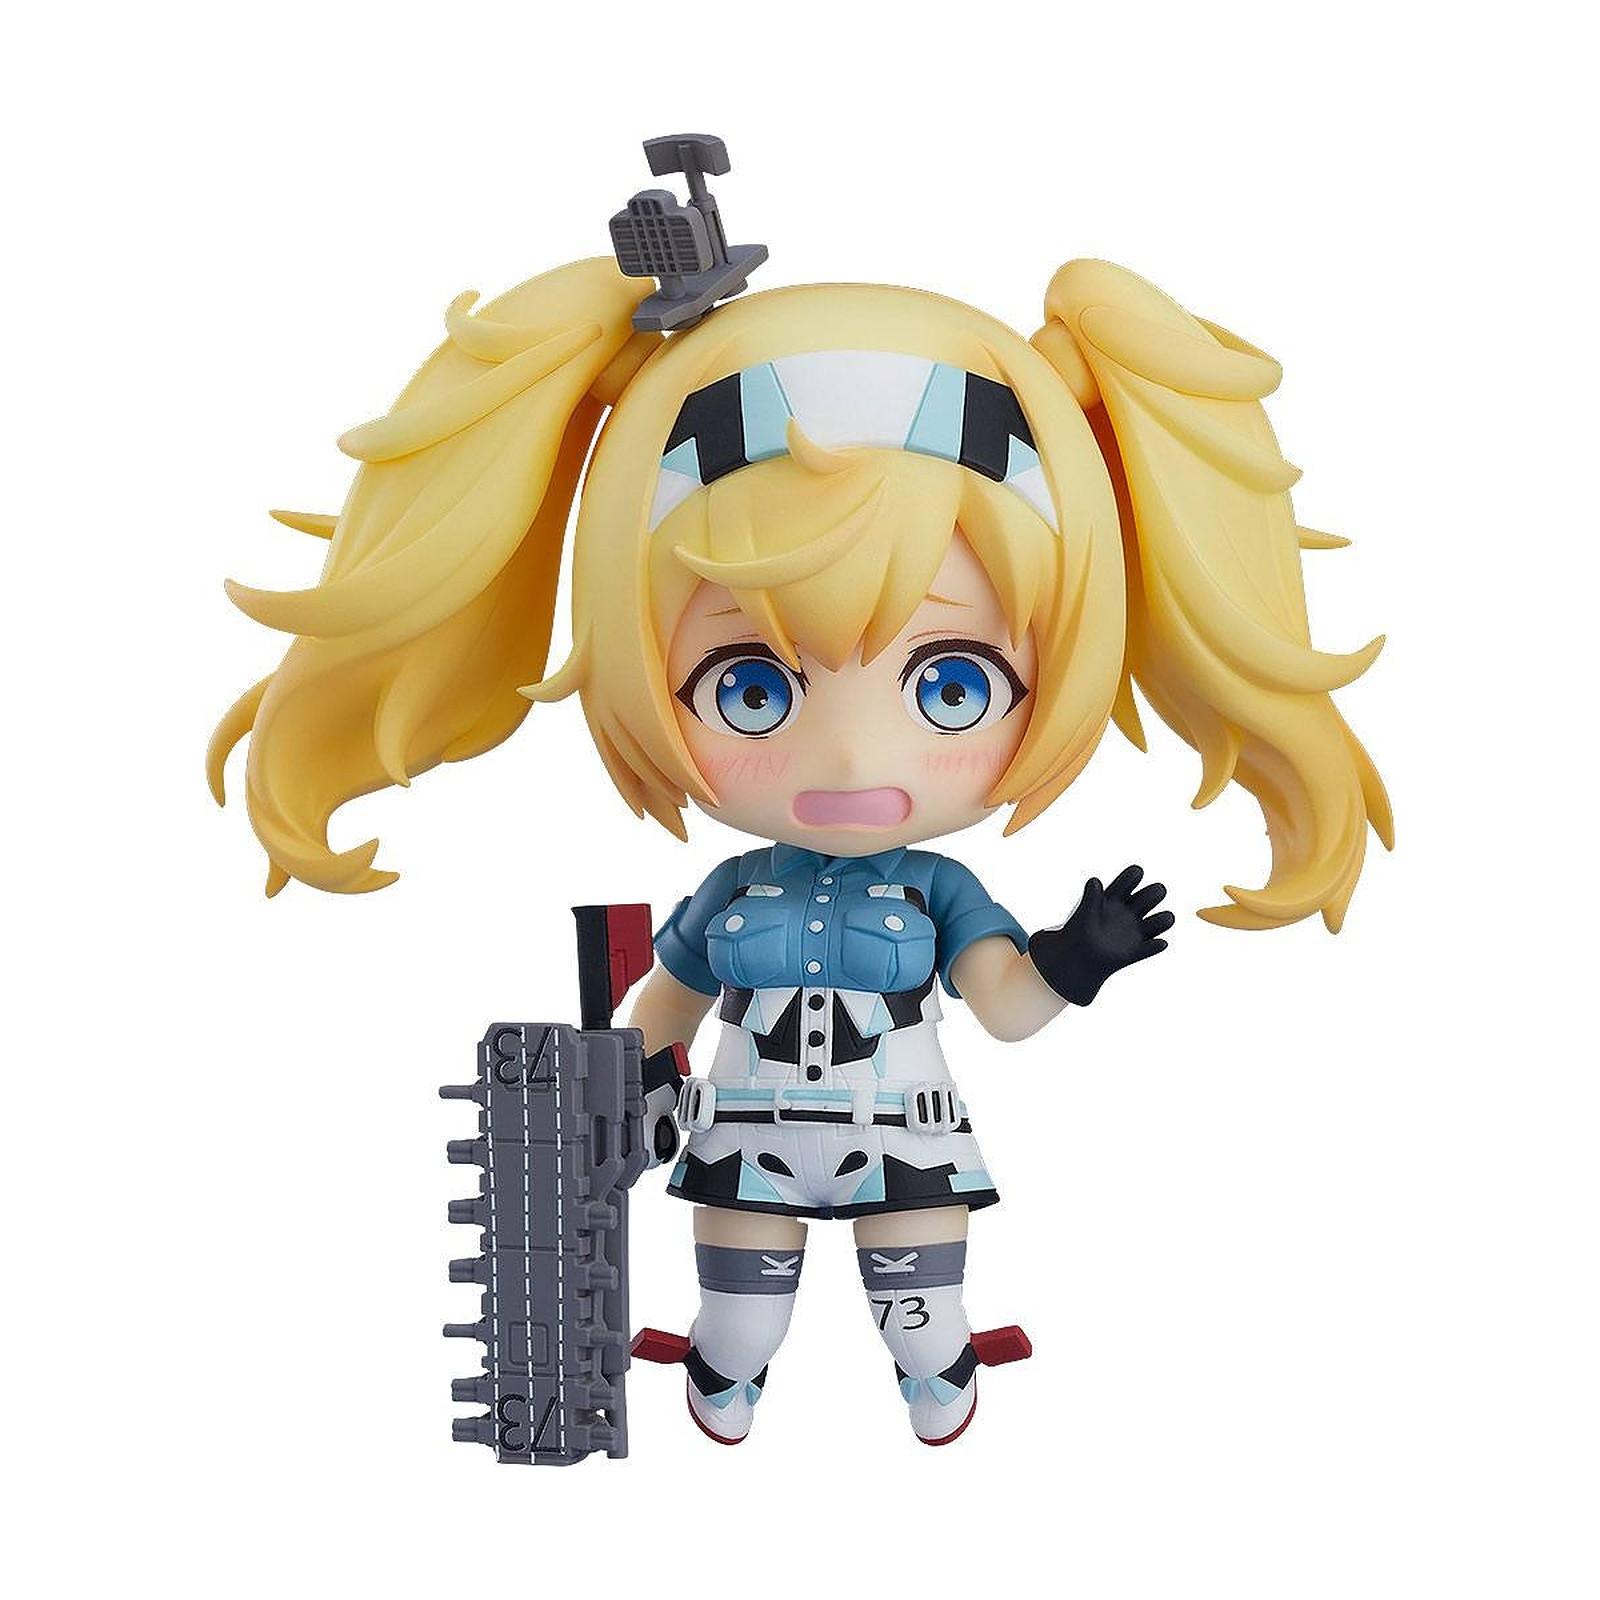 Kantai Collection - Figurine Nendoroid Gambier Bay 10 cm